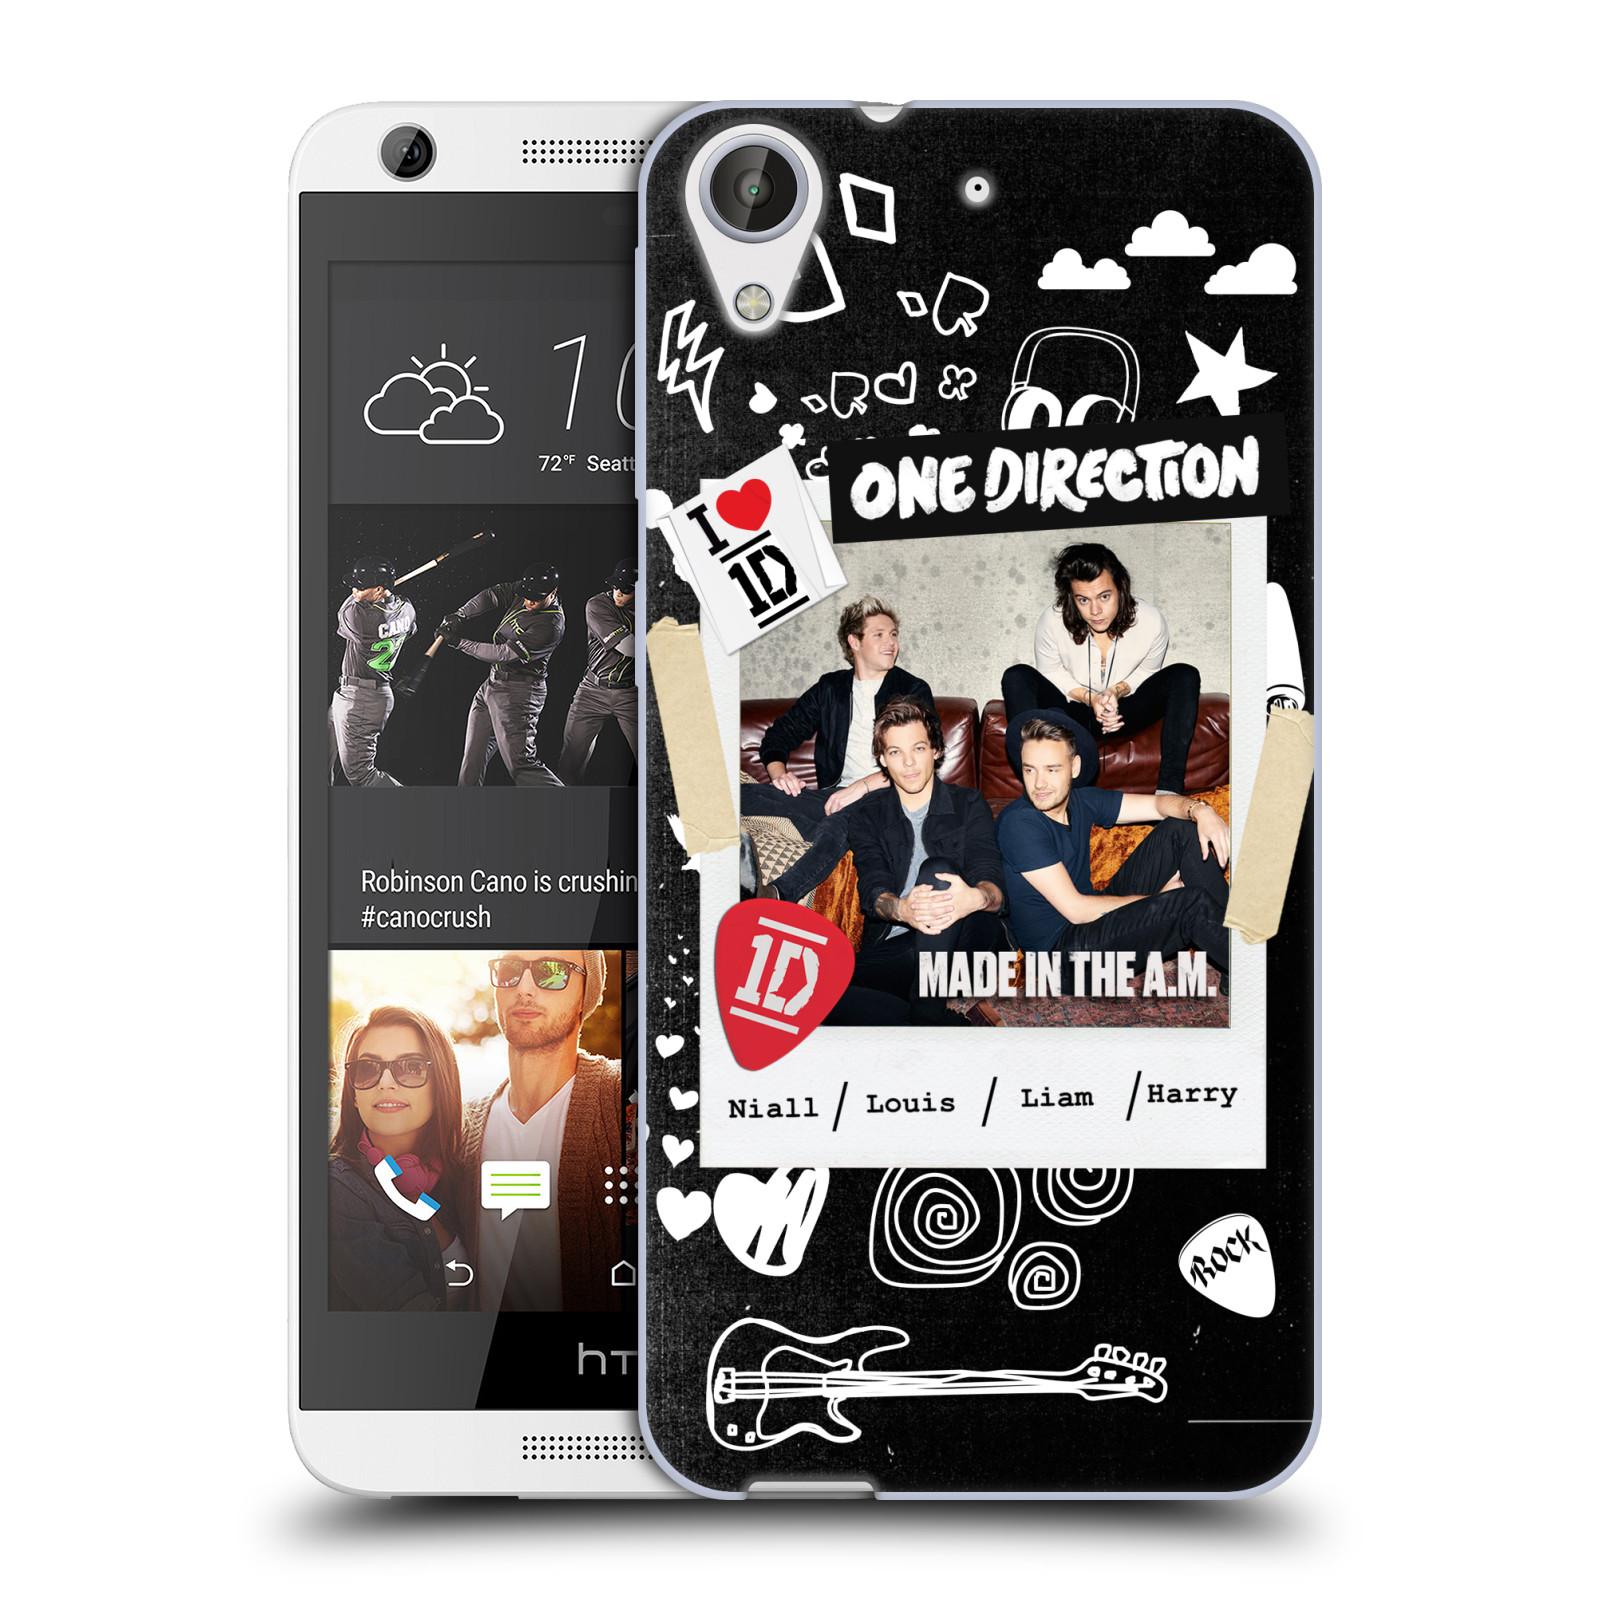 Silikonové pouzdro na mobil HTC Desire 626 / 626G HEAD CASE One Direction - S kytárou (Silikonový kryt či obal One Direction Official na mobilní telefon HTC Desire 626 a 626G Dual SIM)